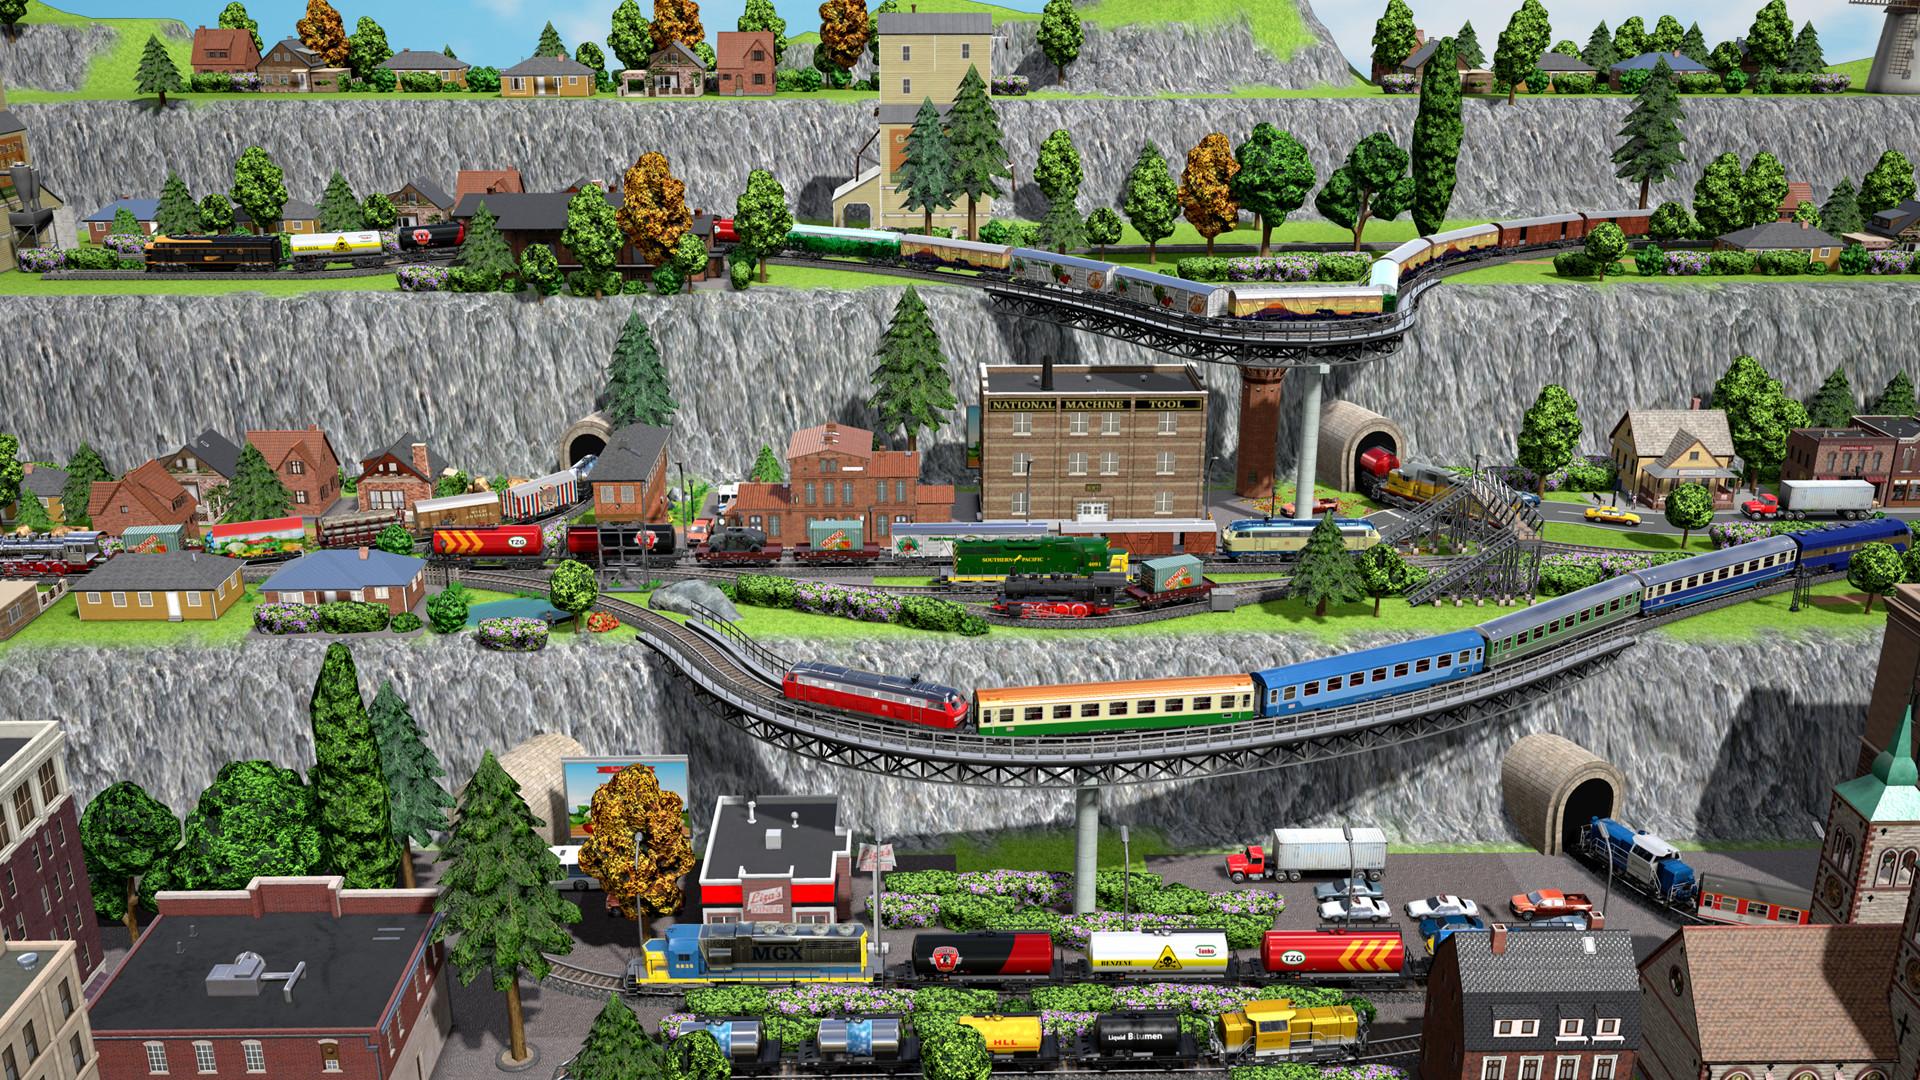 Lego train layout software mac download